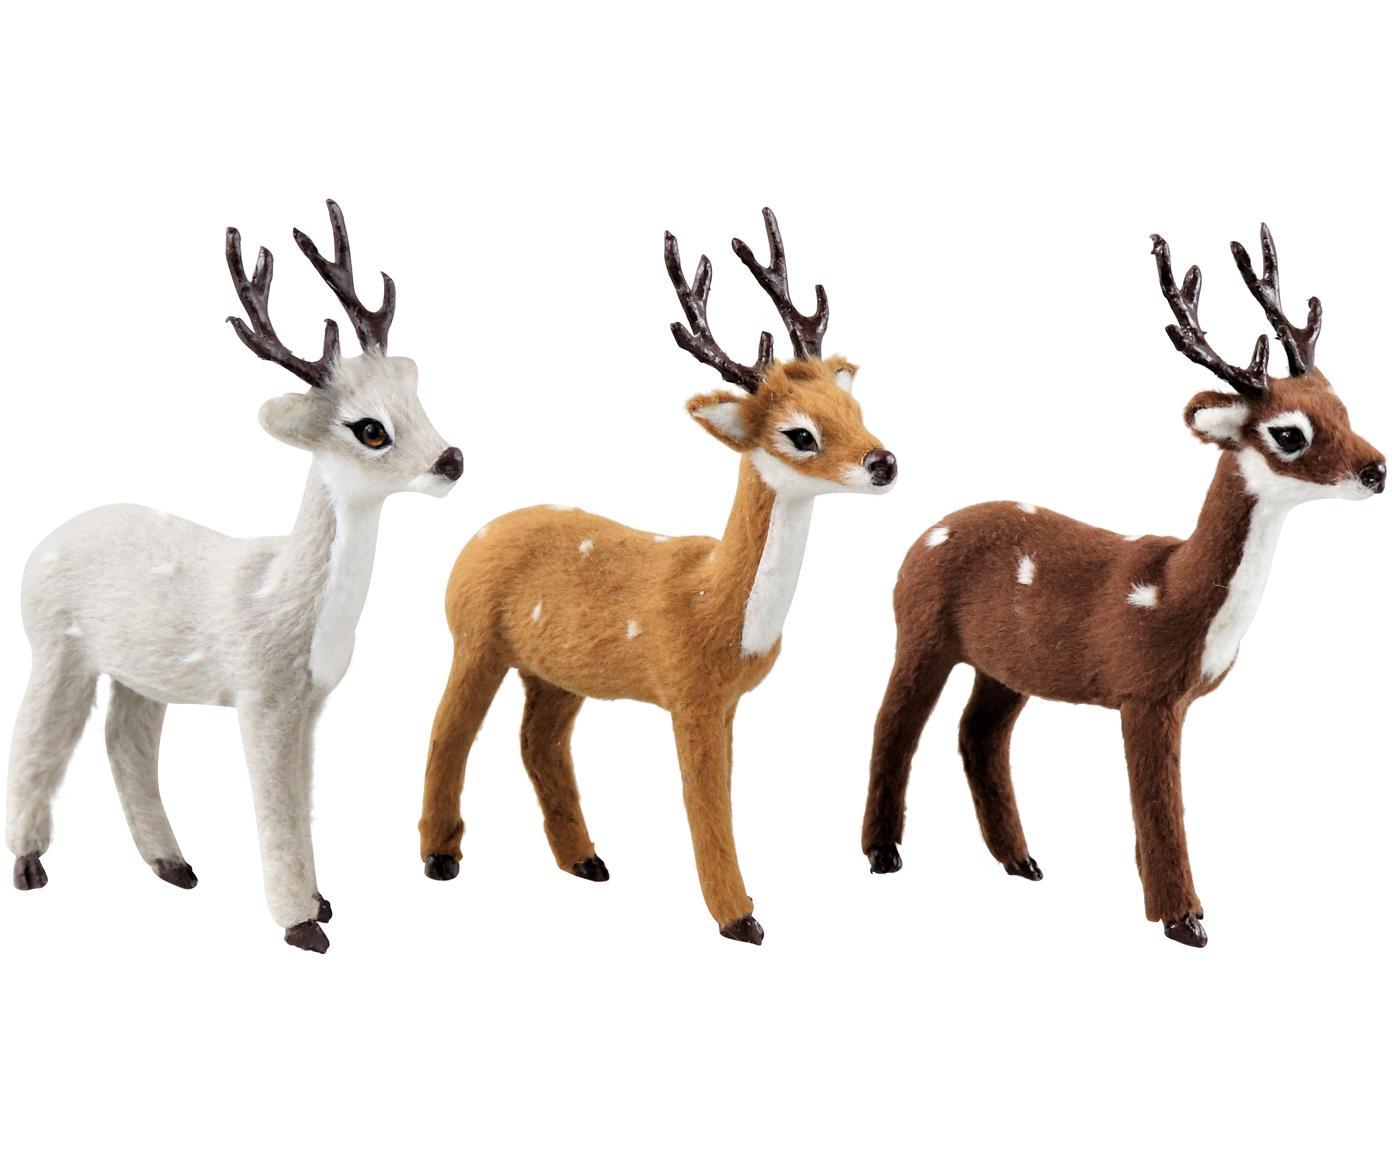 Deko-Objekte Deer, 3-tlg., Polyresin, Weiß, Brauntöne, 13 x 13 cm